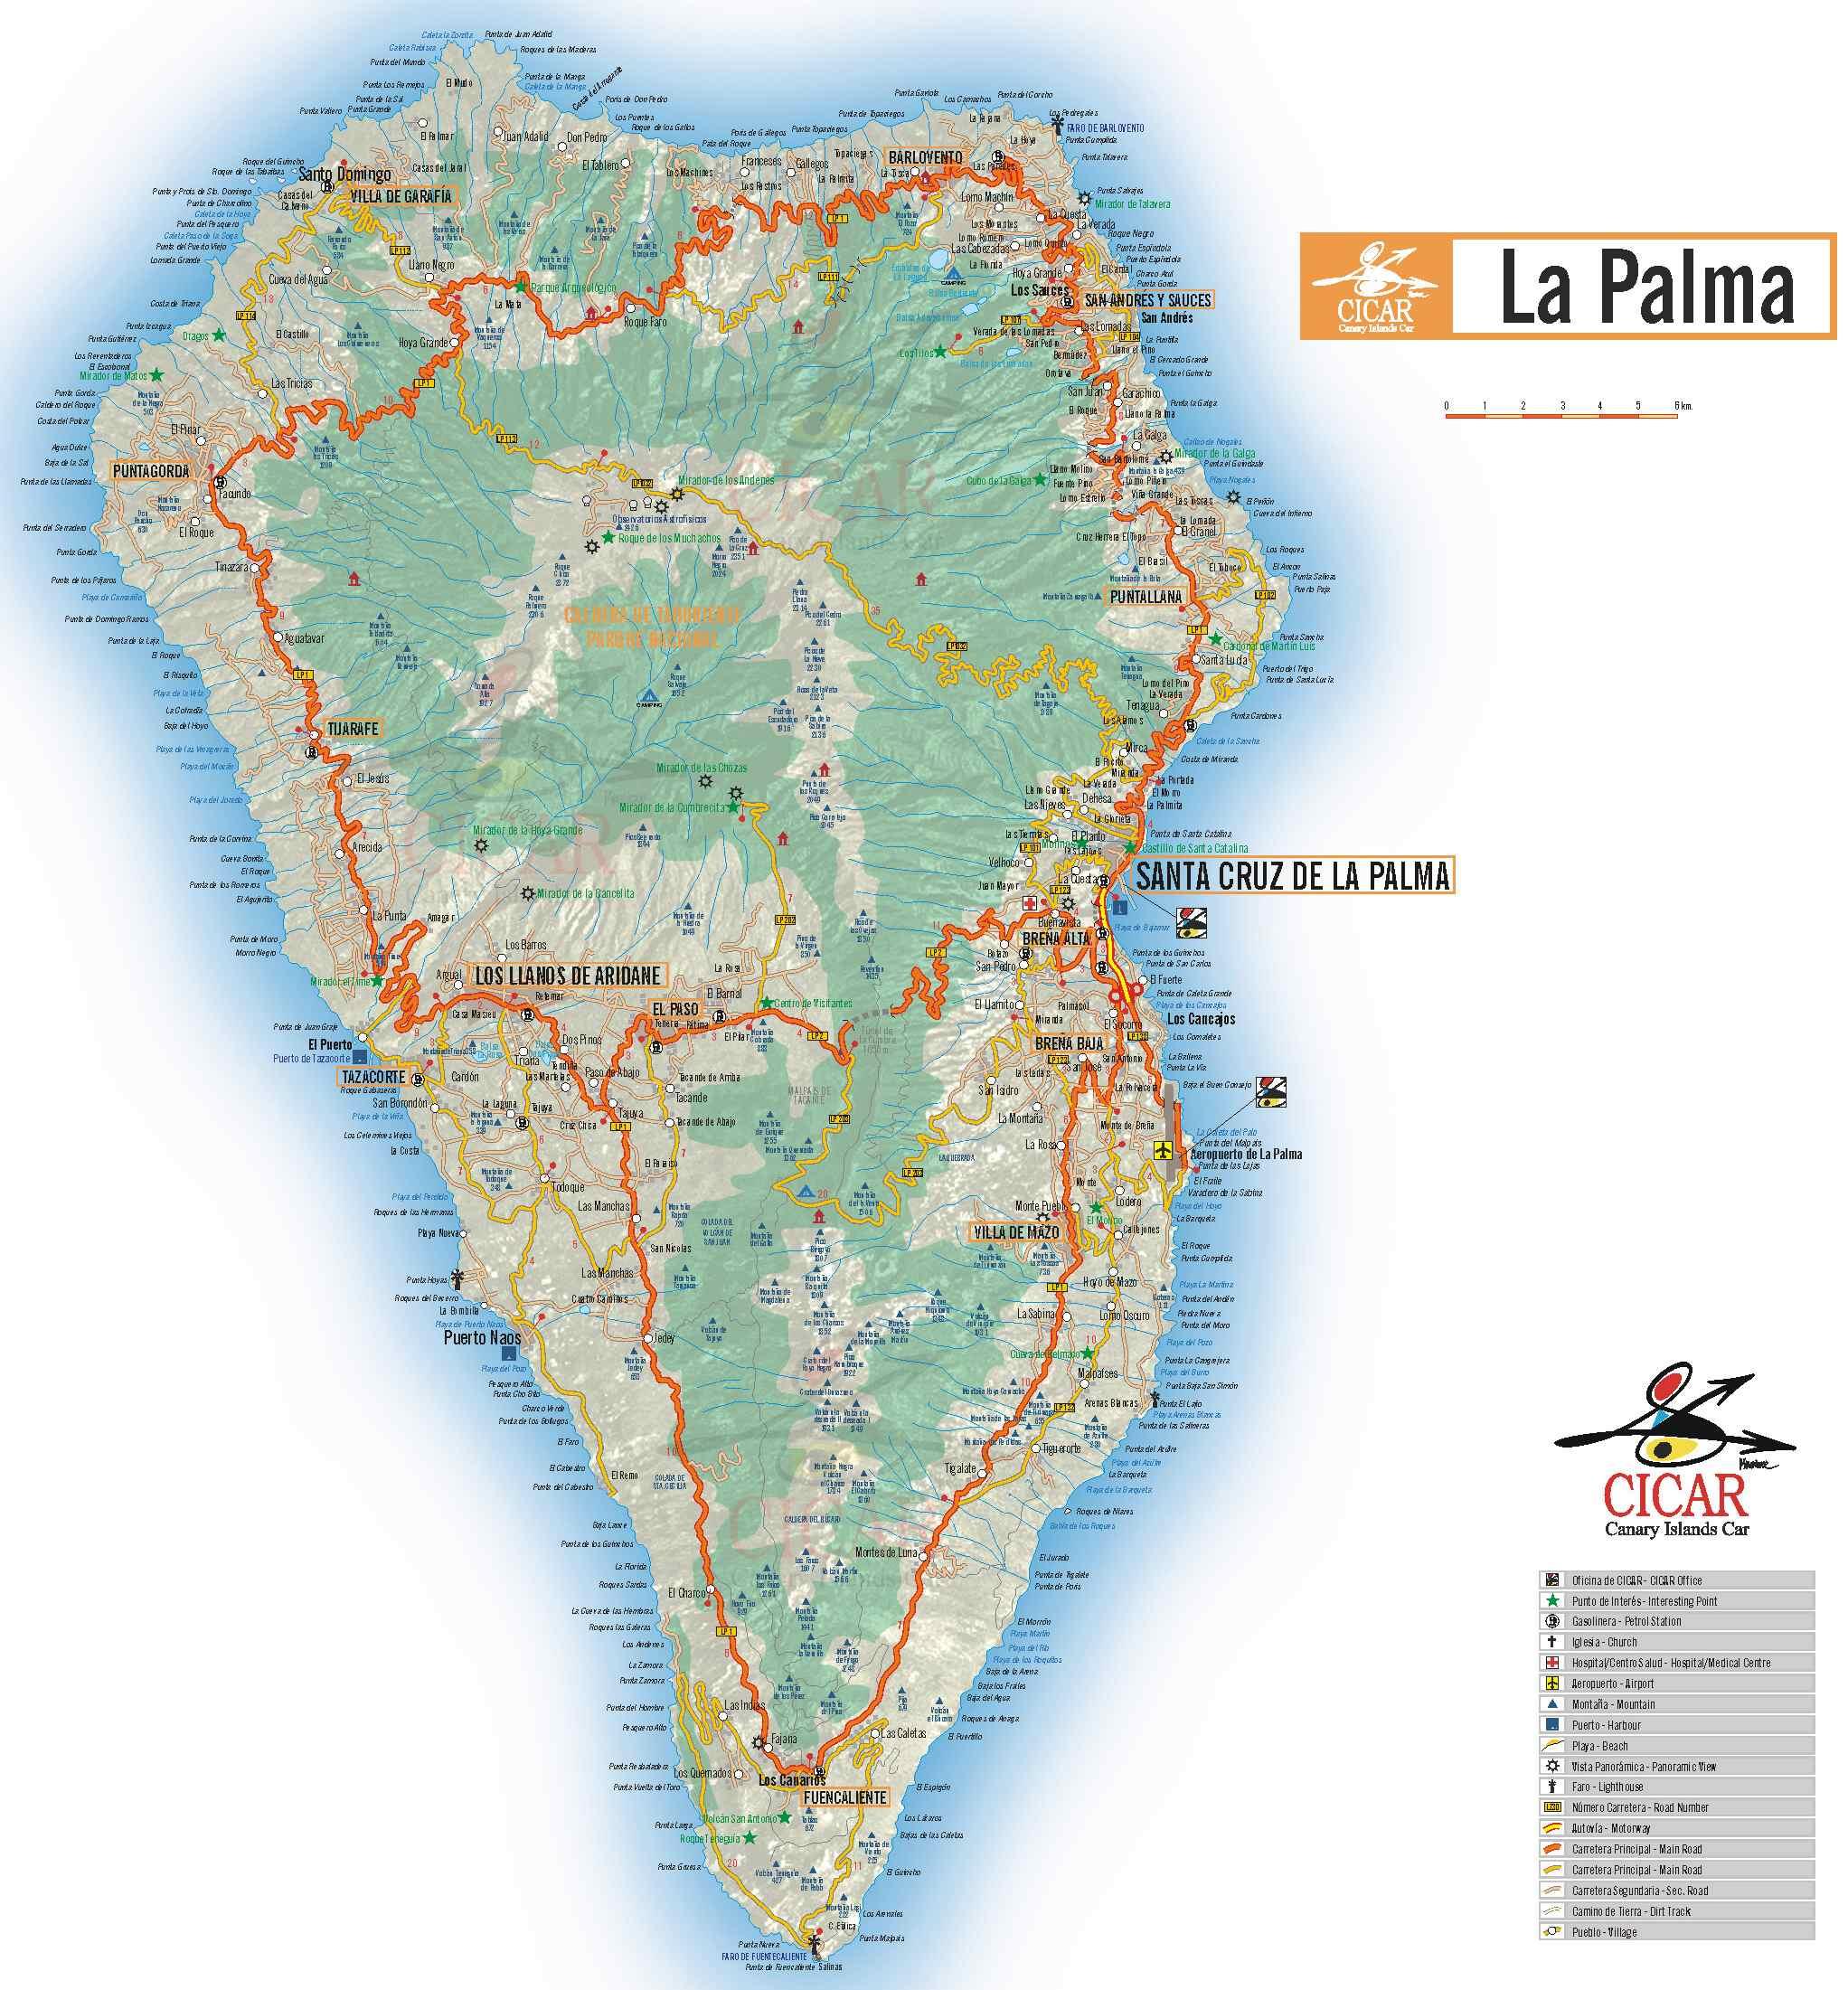 la palma karte La Palma Karte   grosse Karte La Palma